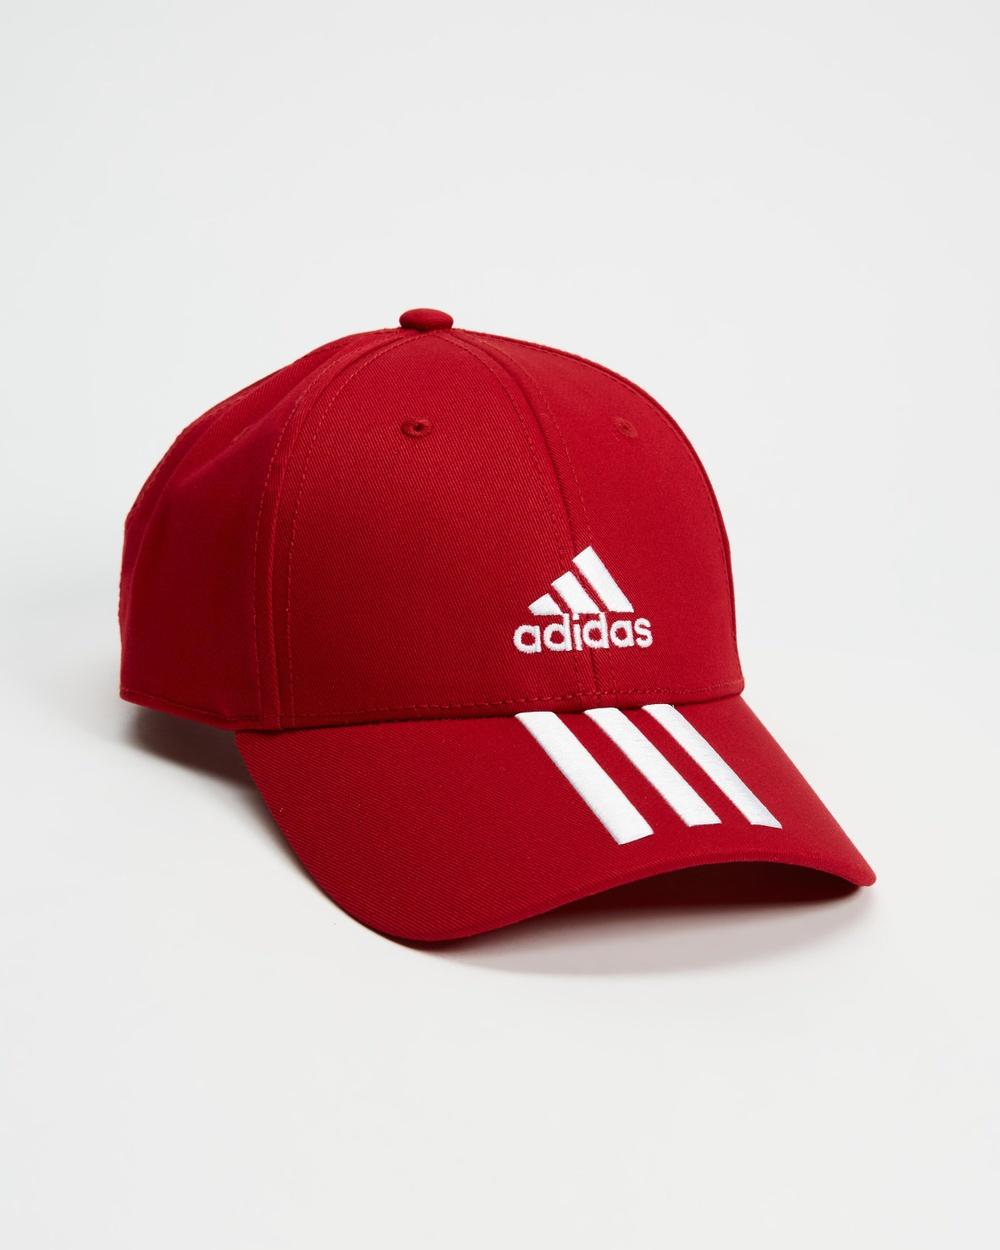 adidas Performance Baseball 3 Stripes Twill Training Cap Headwear Team Victory Red & White 3-Stripes